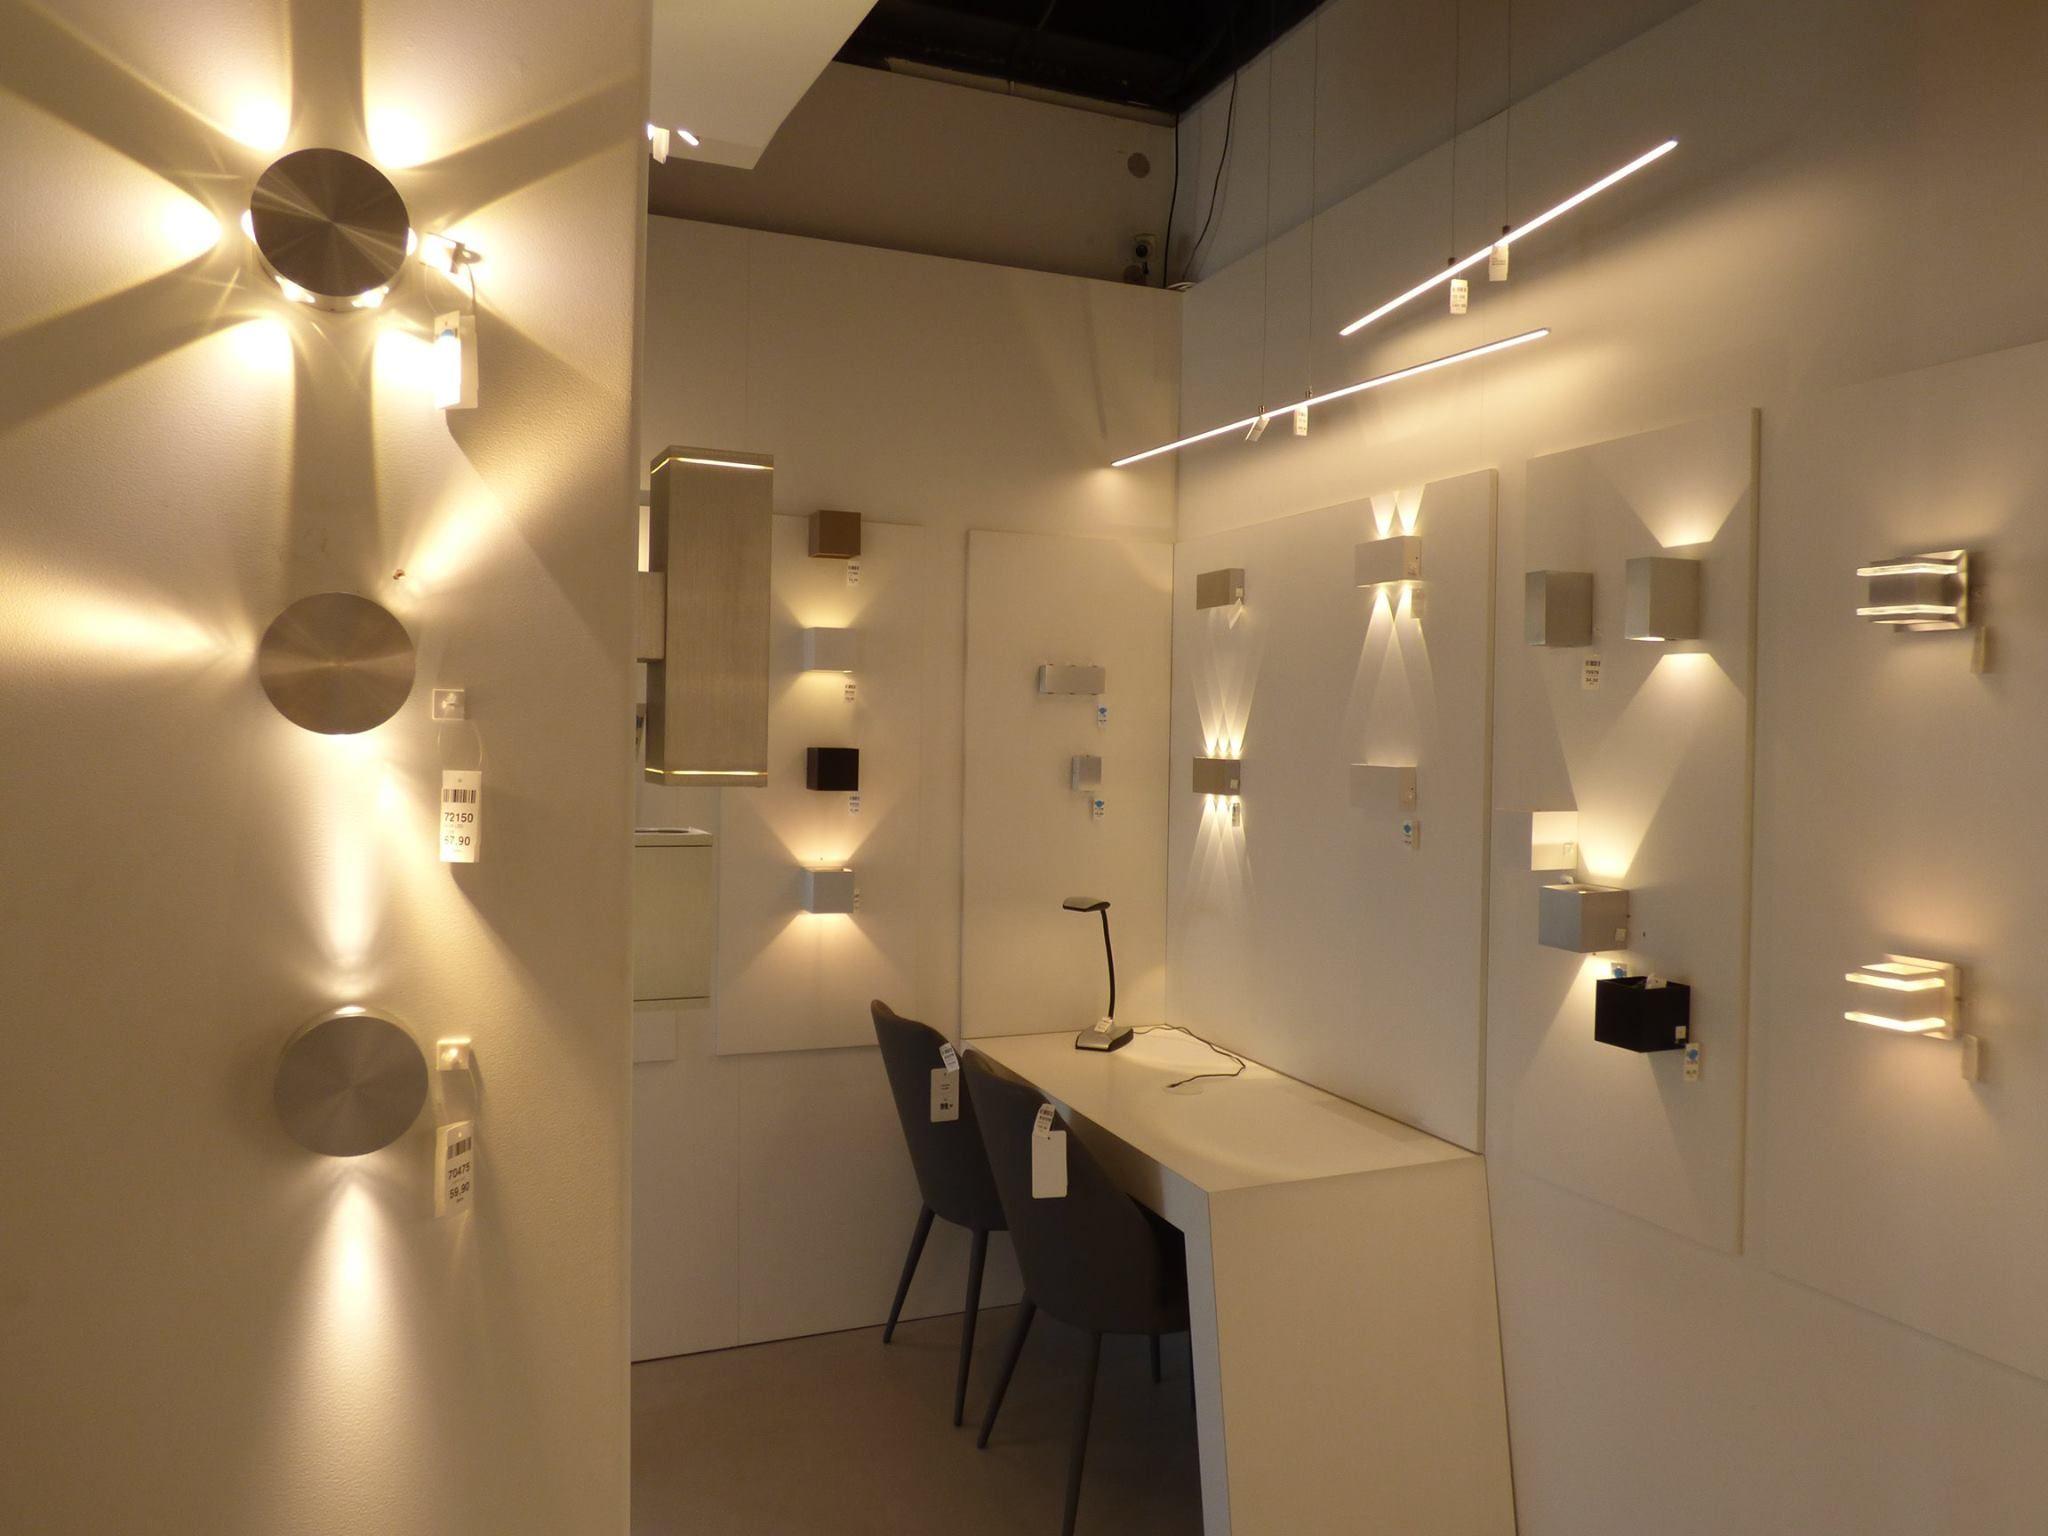 ILUMINACIN showroom tienda interior   lmparas